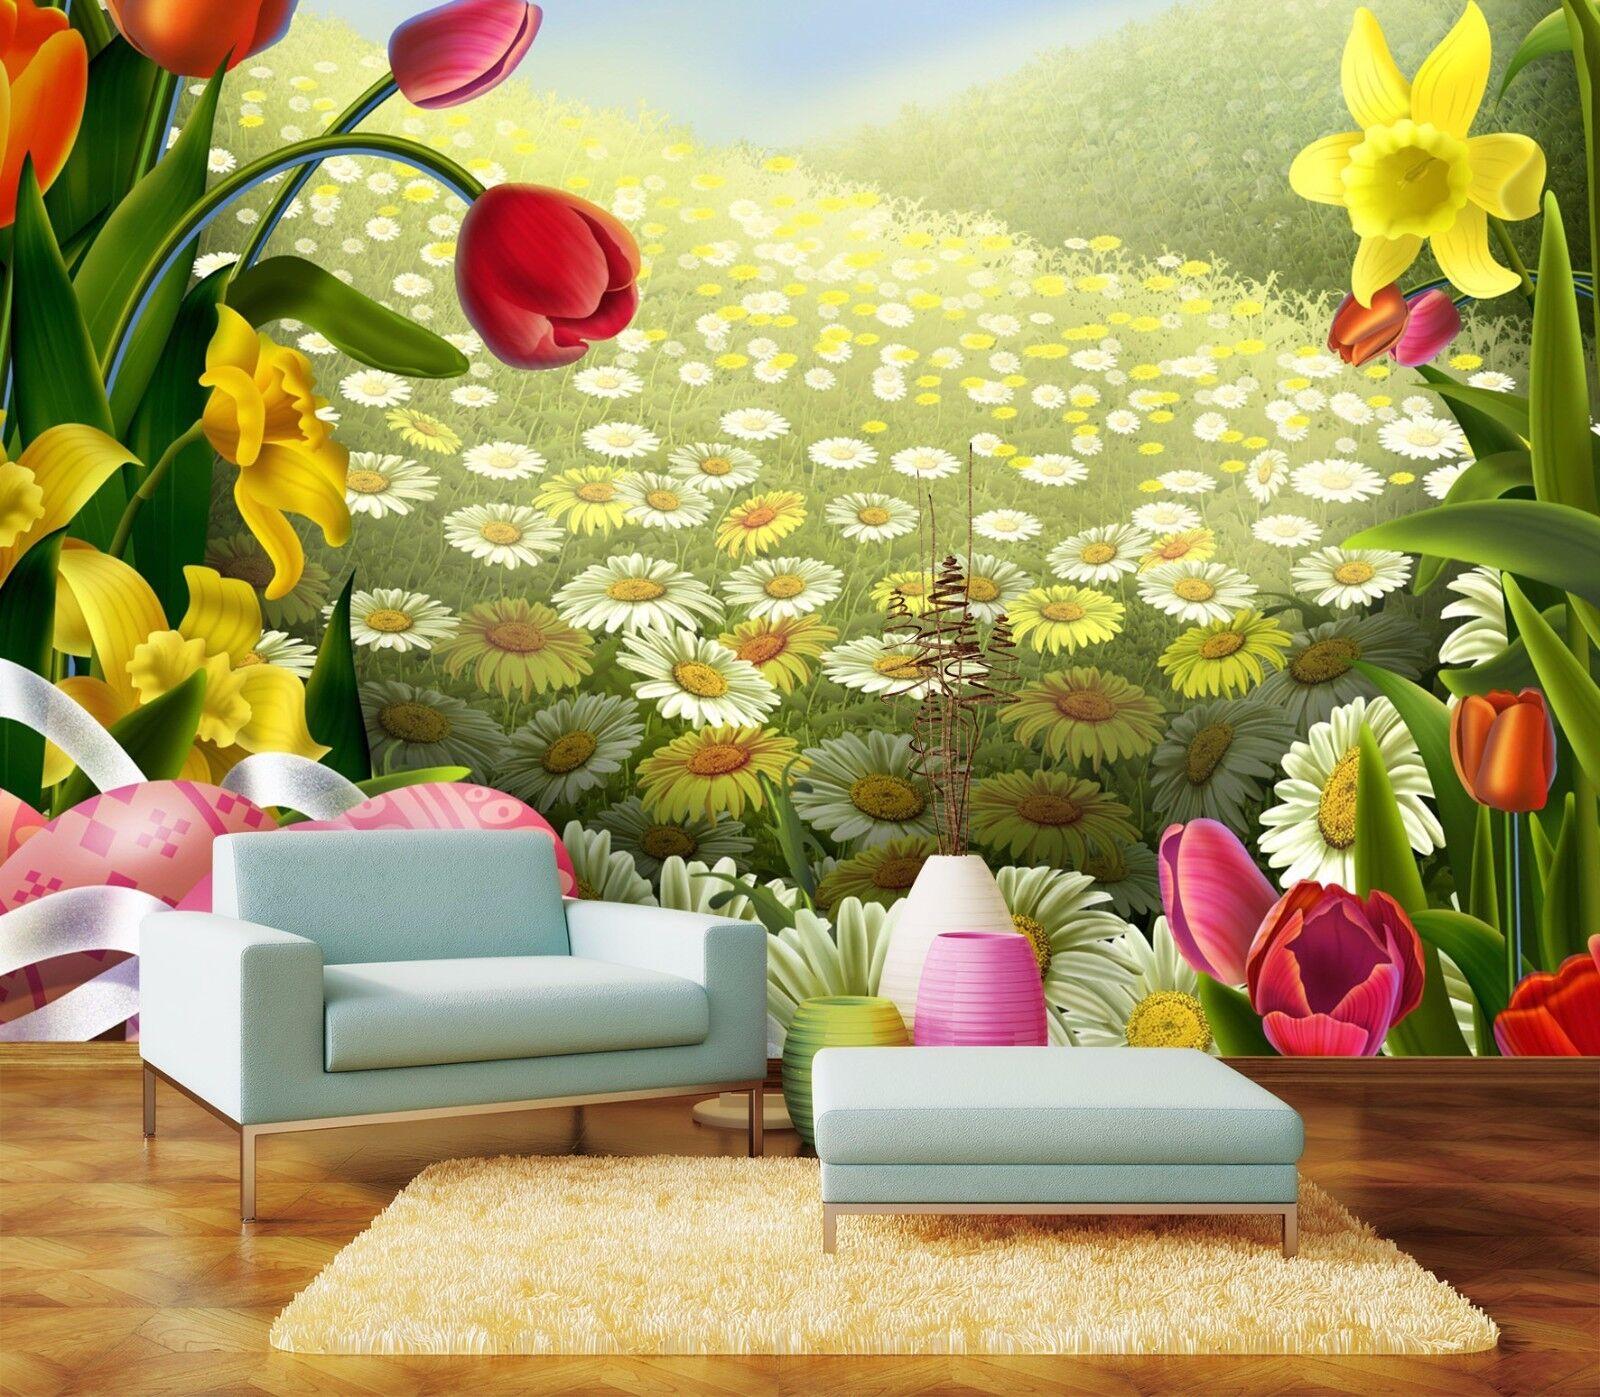 3D Tulip Daisy Field 8 Wall Paper Murals Wall Print Wall Wallpaper Mural AU Kyra